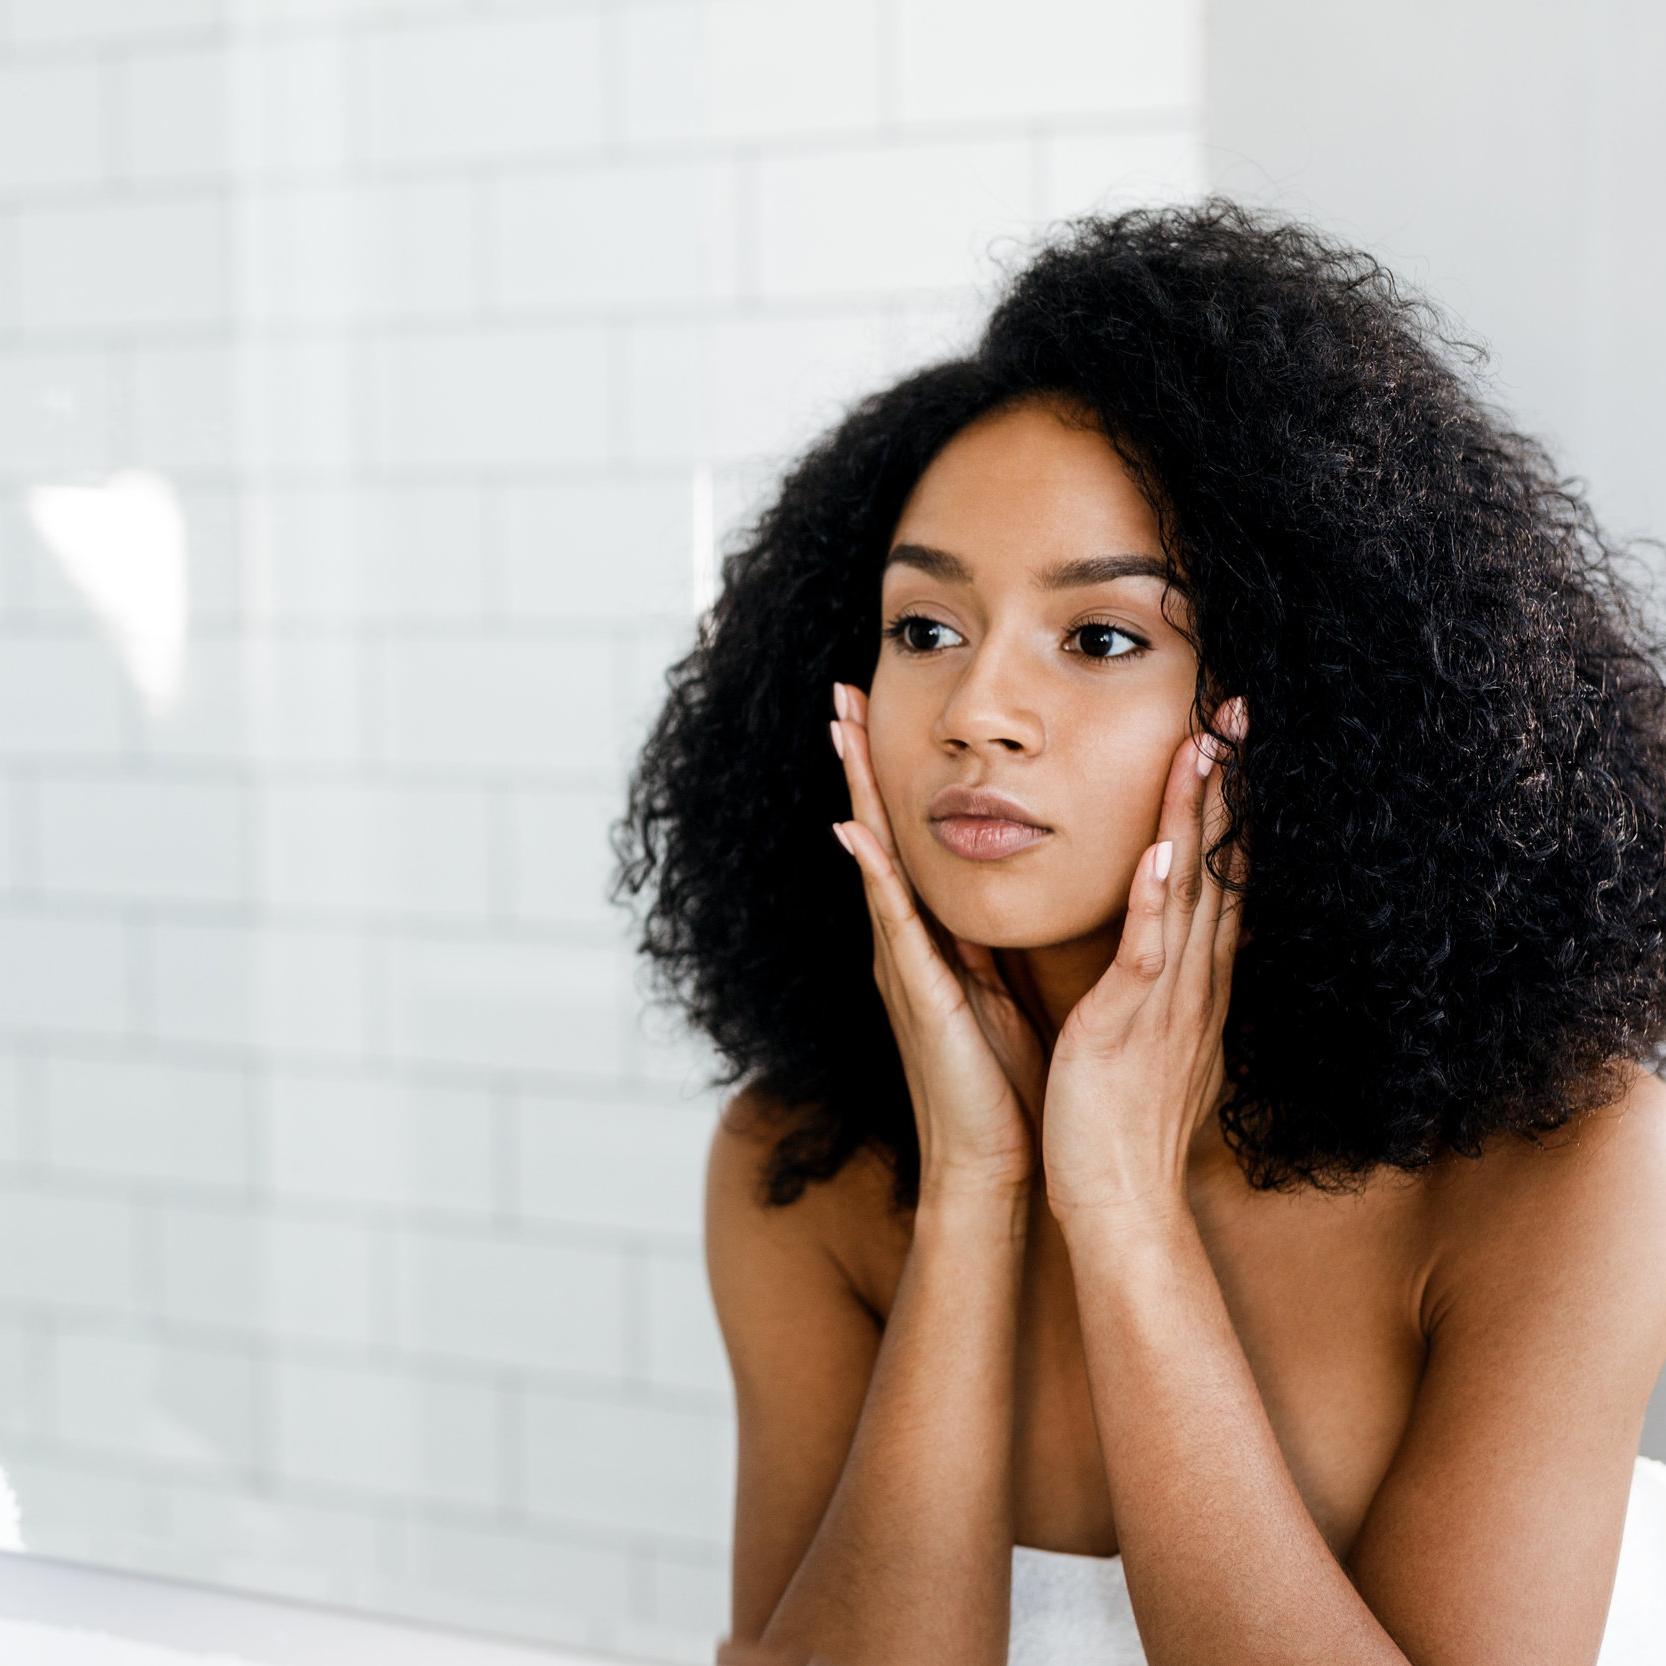 Skin Care Regimens